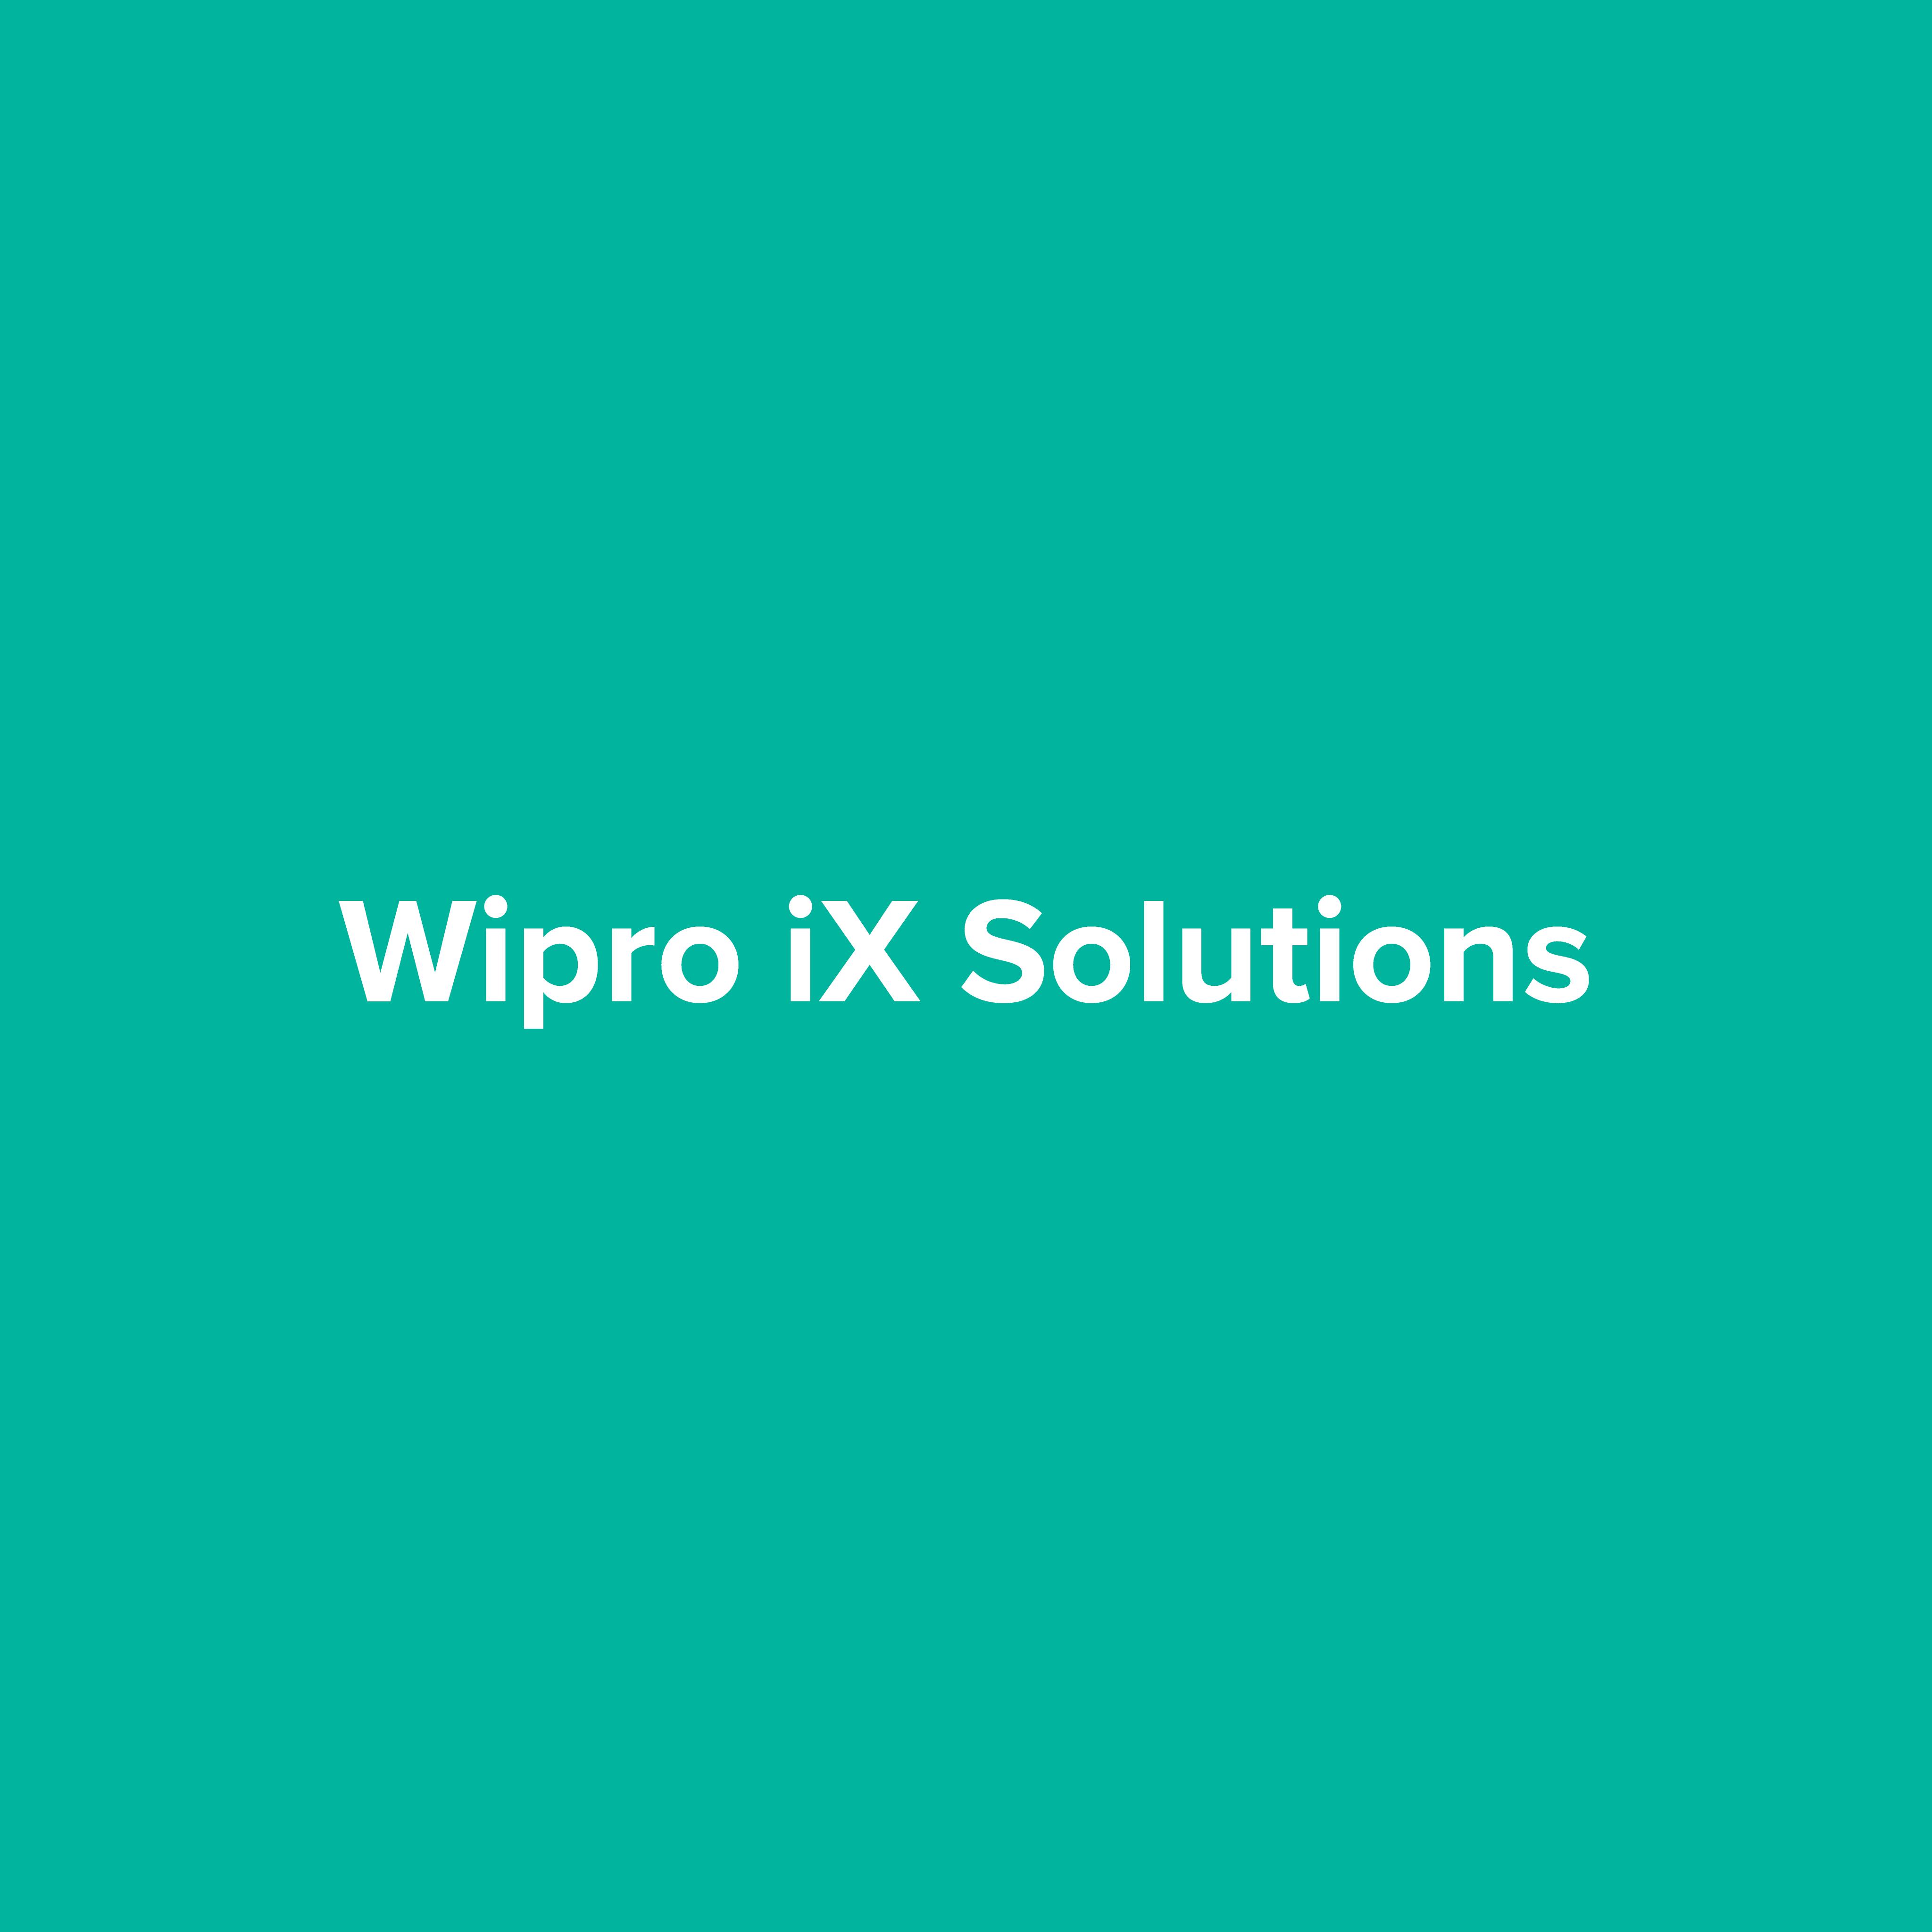 Wipro iX Solutions